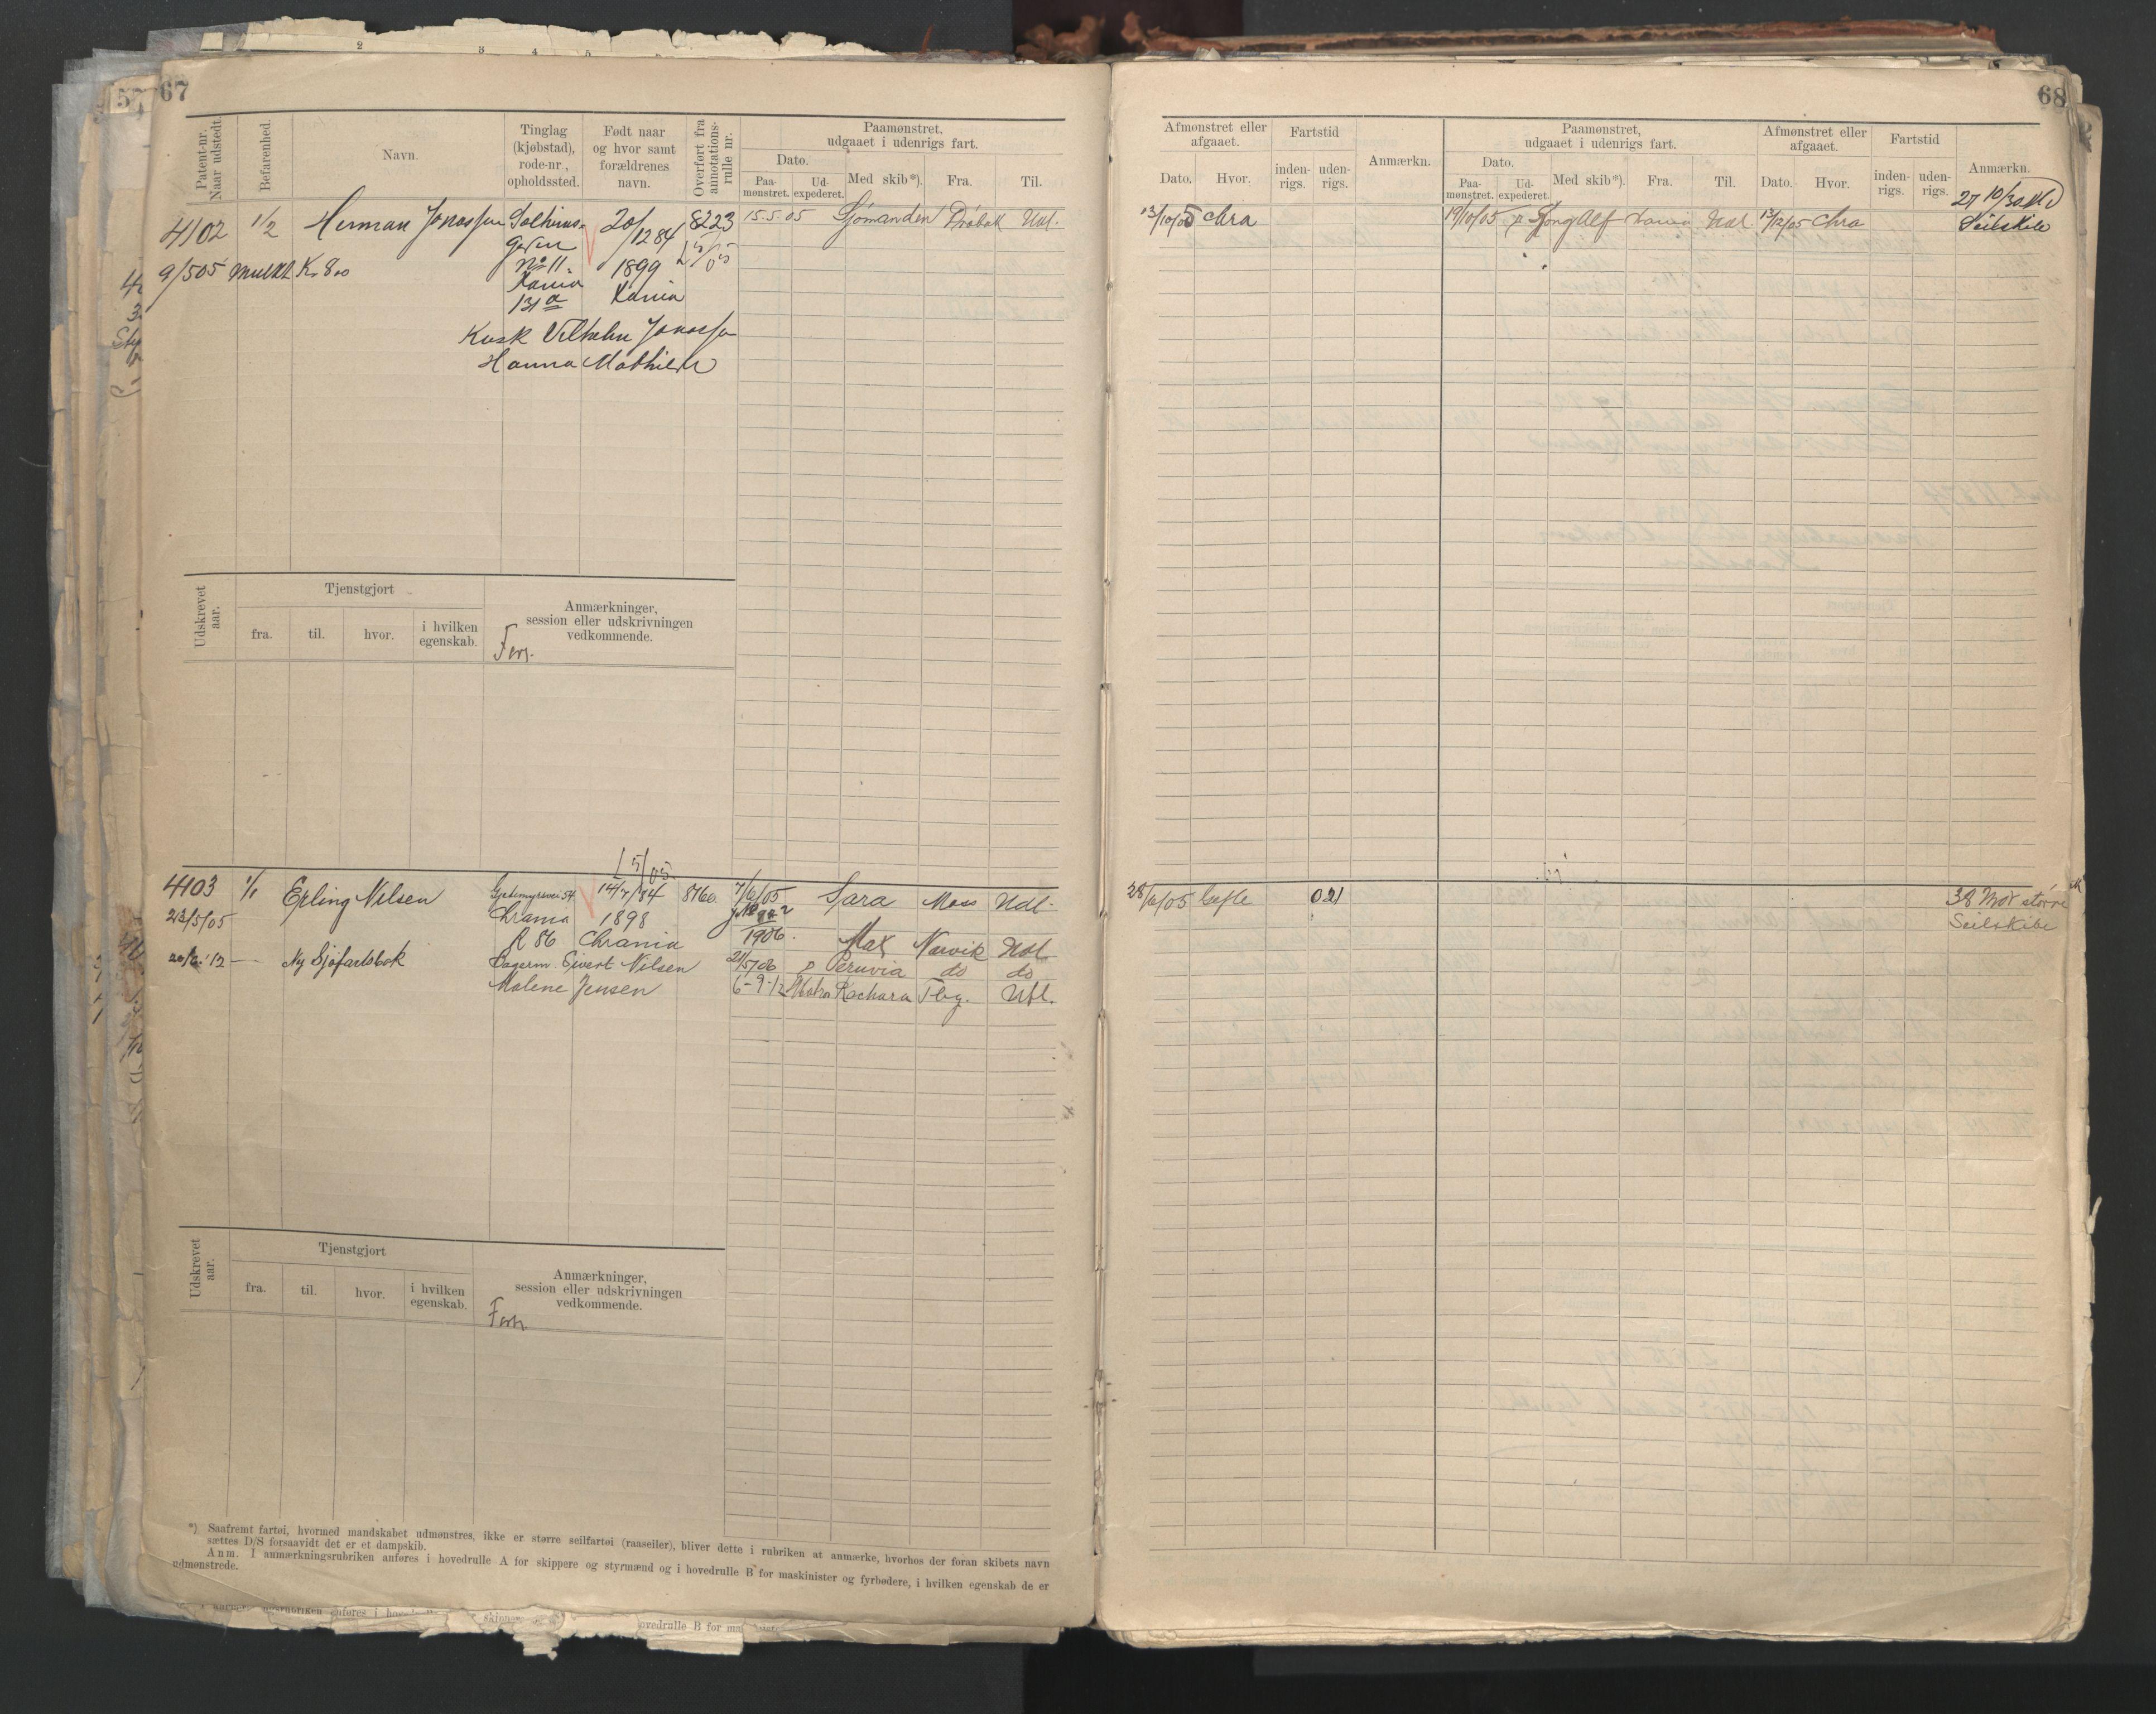 SAO, Oslo sjømannskontor, F/Fc/L0004: Hovedrulle, 1904, s. 67-68